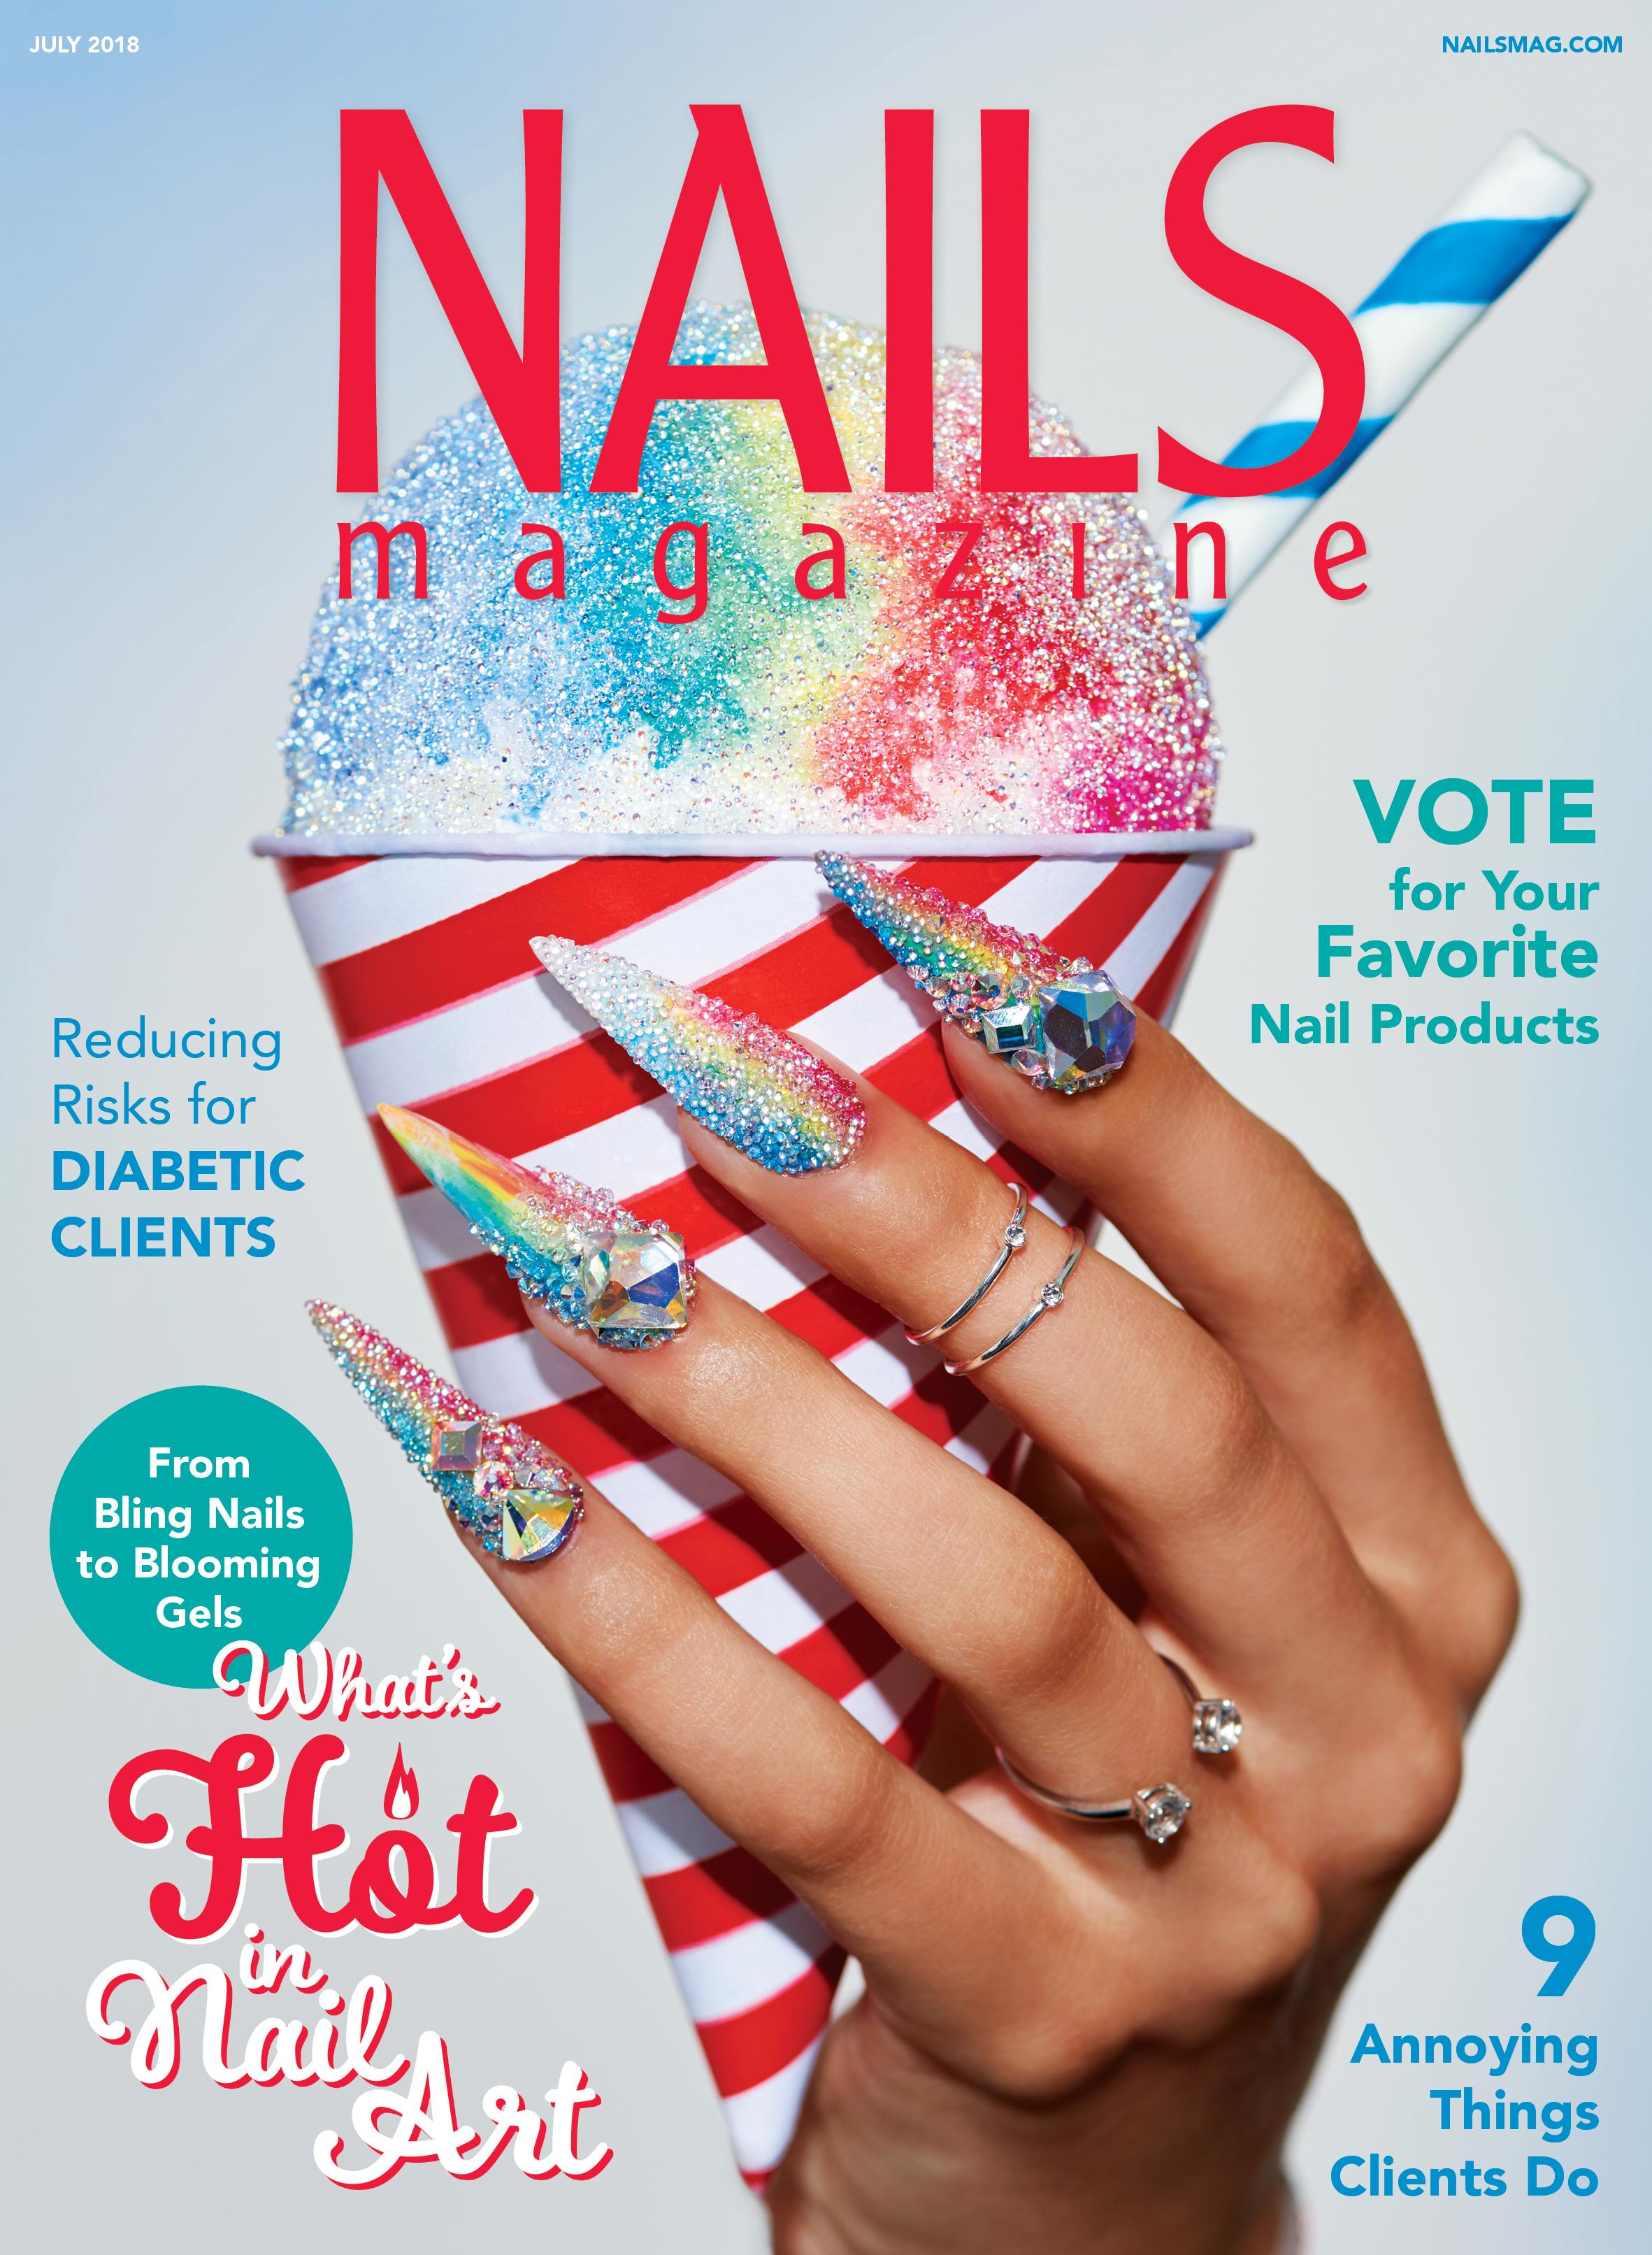 NAILS Magazine | July 2018 Issue